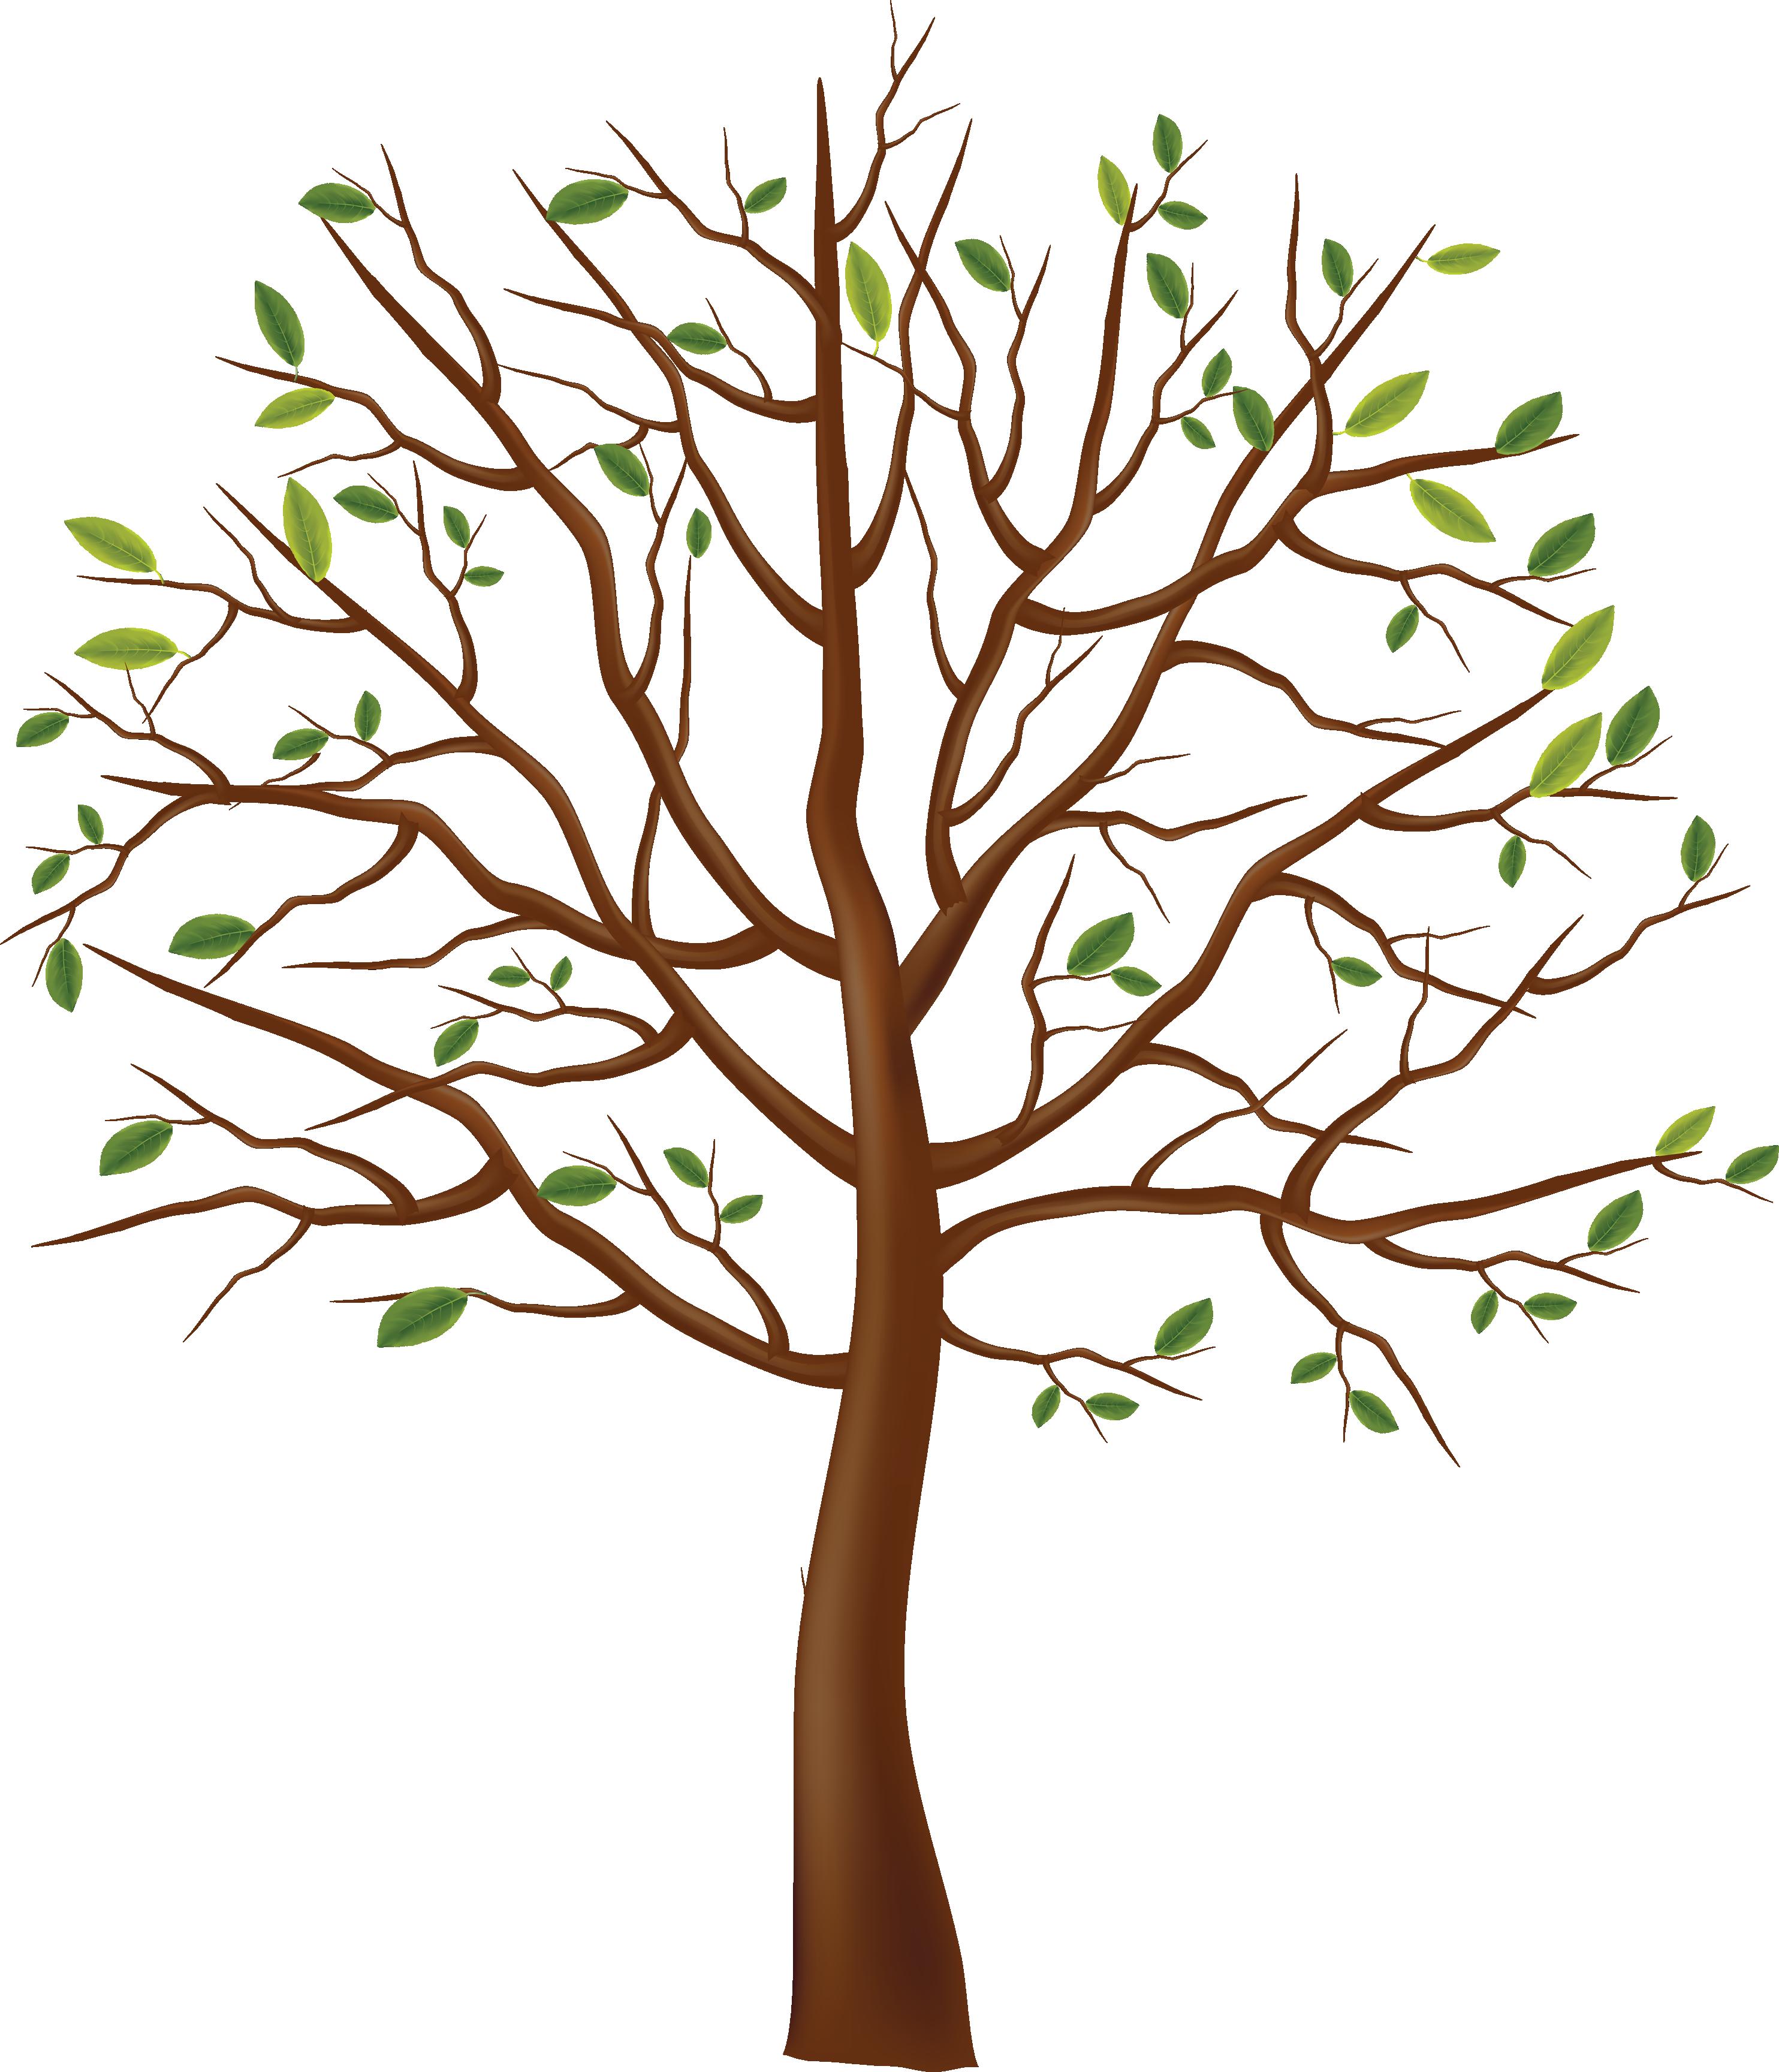 Tree clipart narra. Park free image